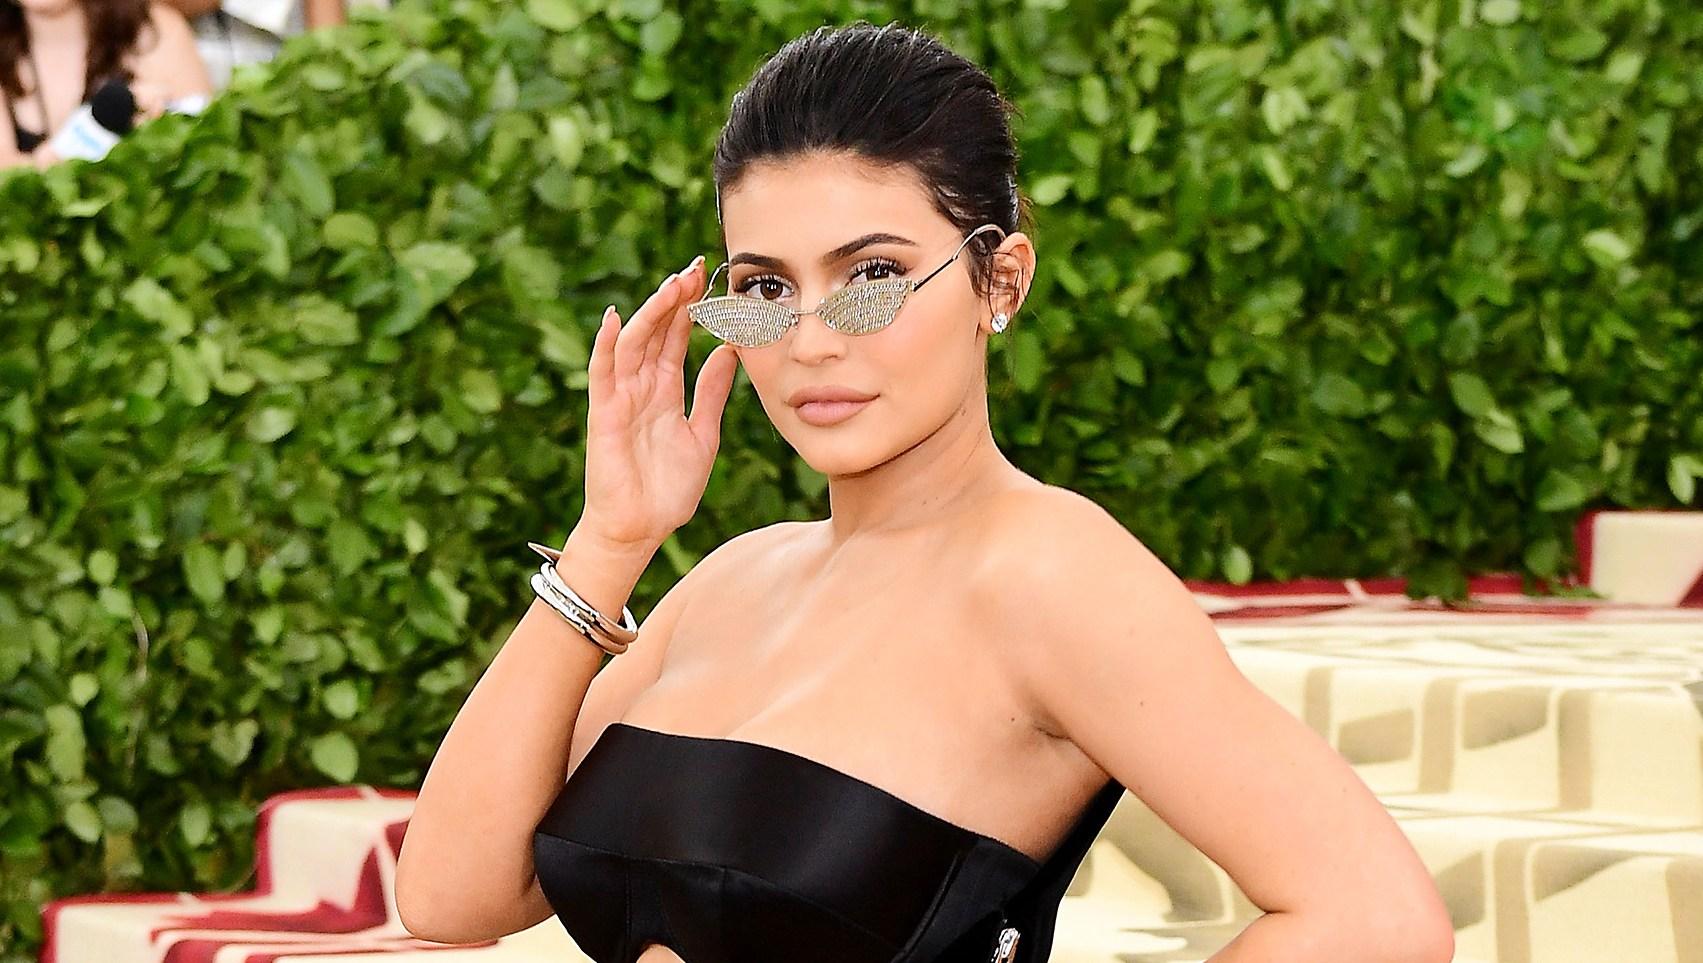 Kylie Jenner GoFundMe Billionaire